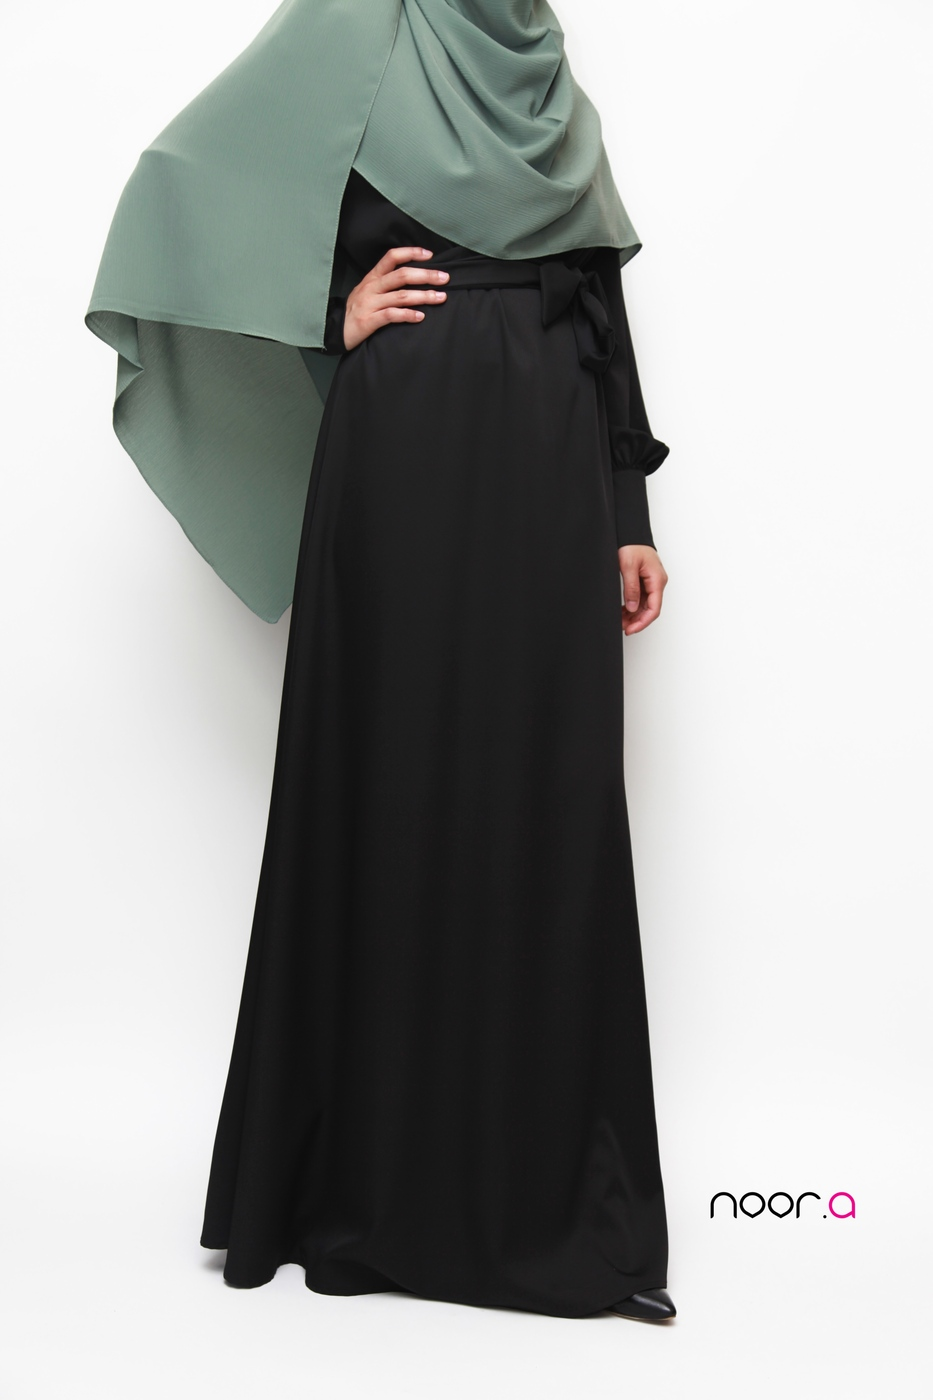 robe-abaya-anika-manches-bouffantes-creations-noora-noire-hijab-soie-de-medine-plissé-vert (6)